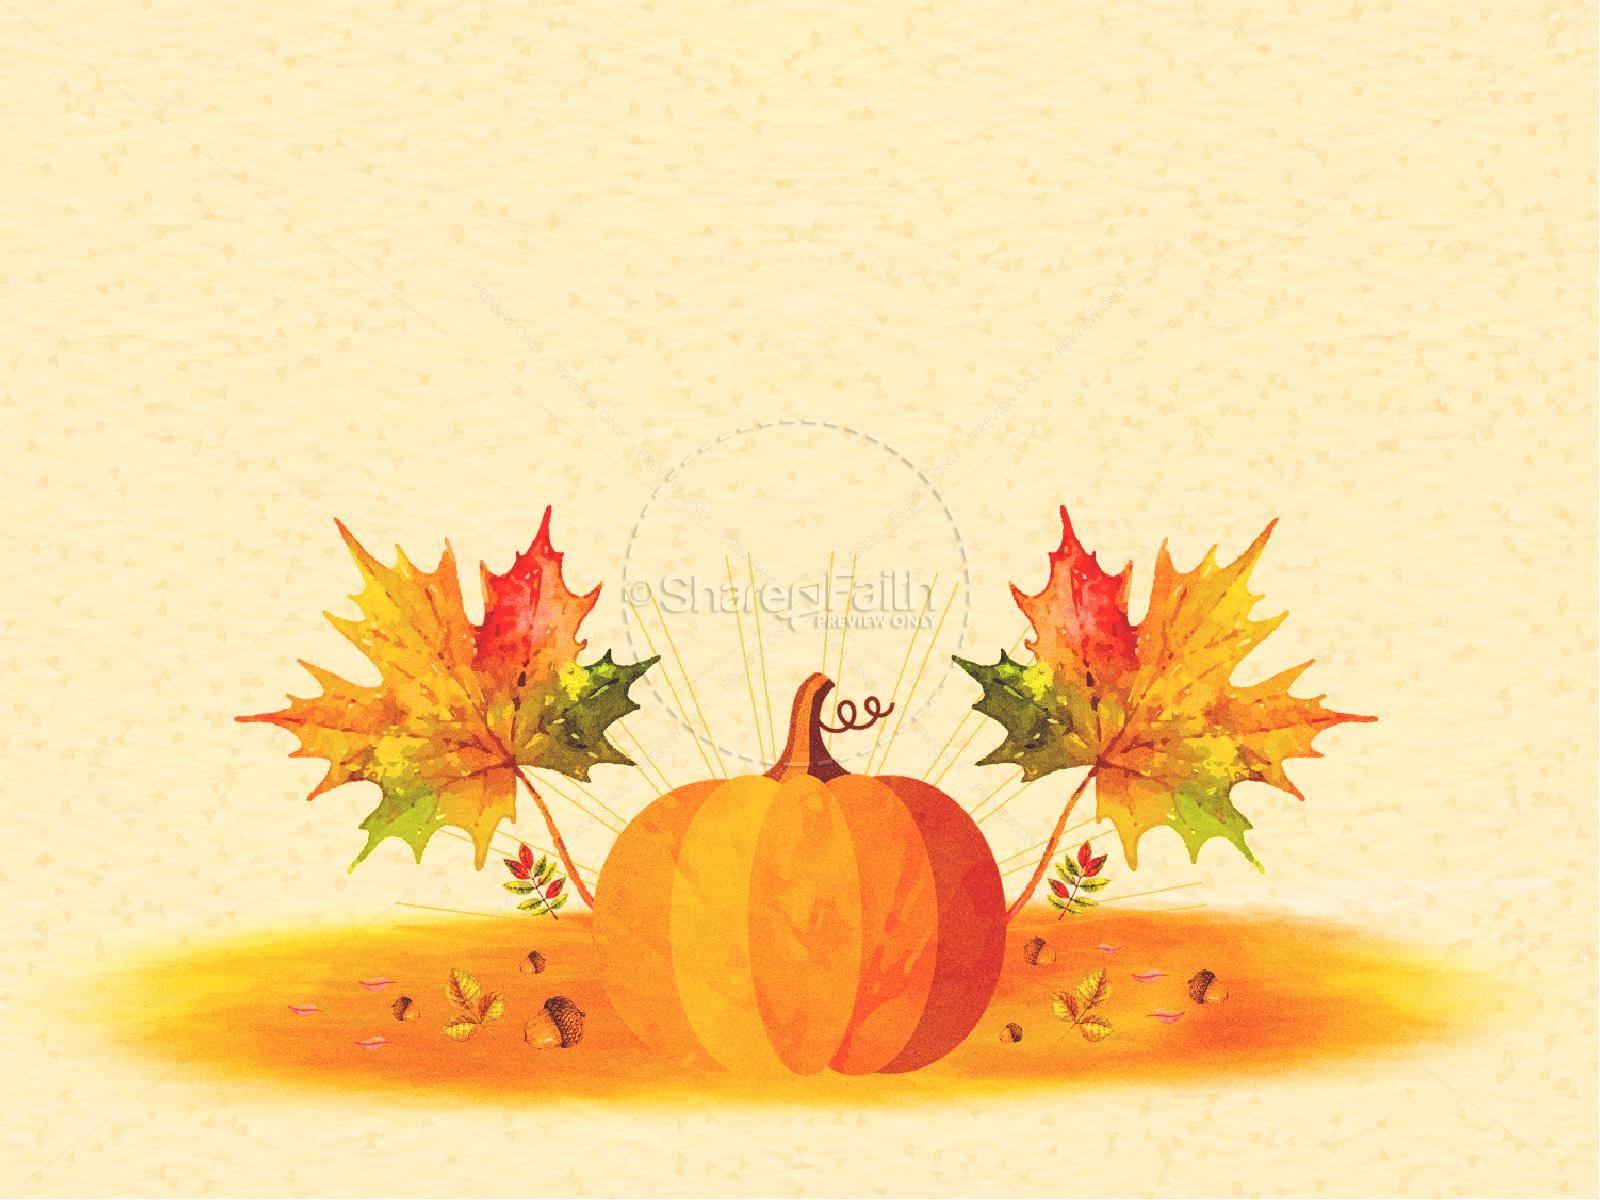 Harvest Party Pumpkin Graphic | slide 8